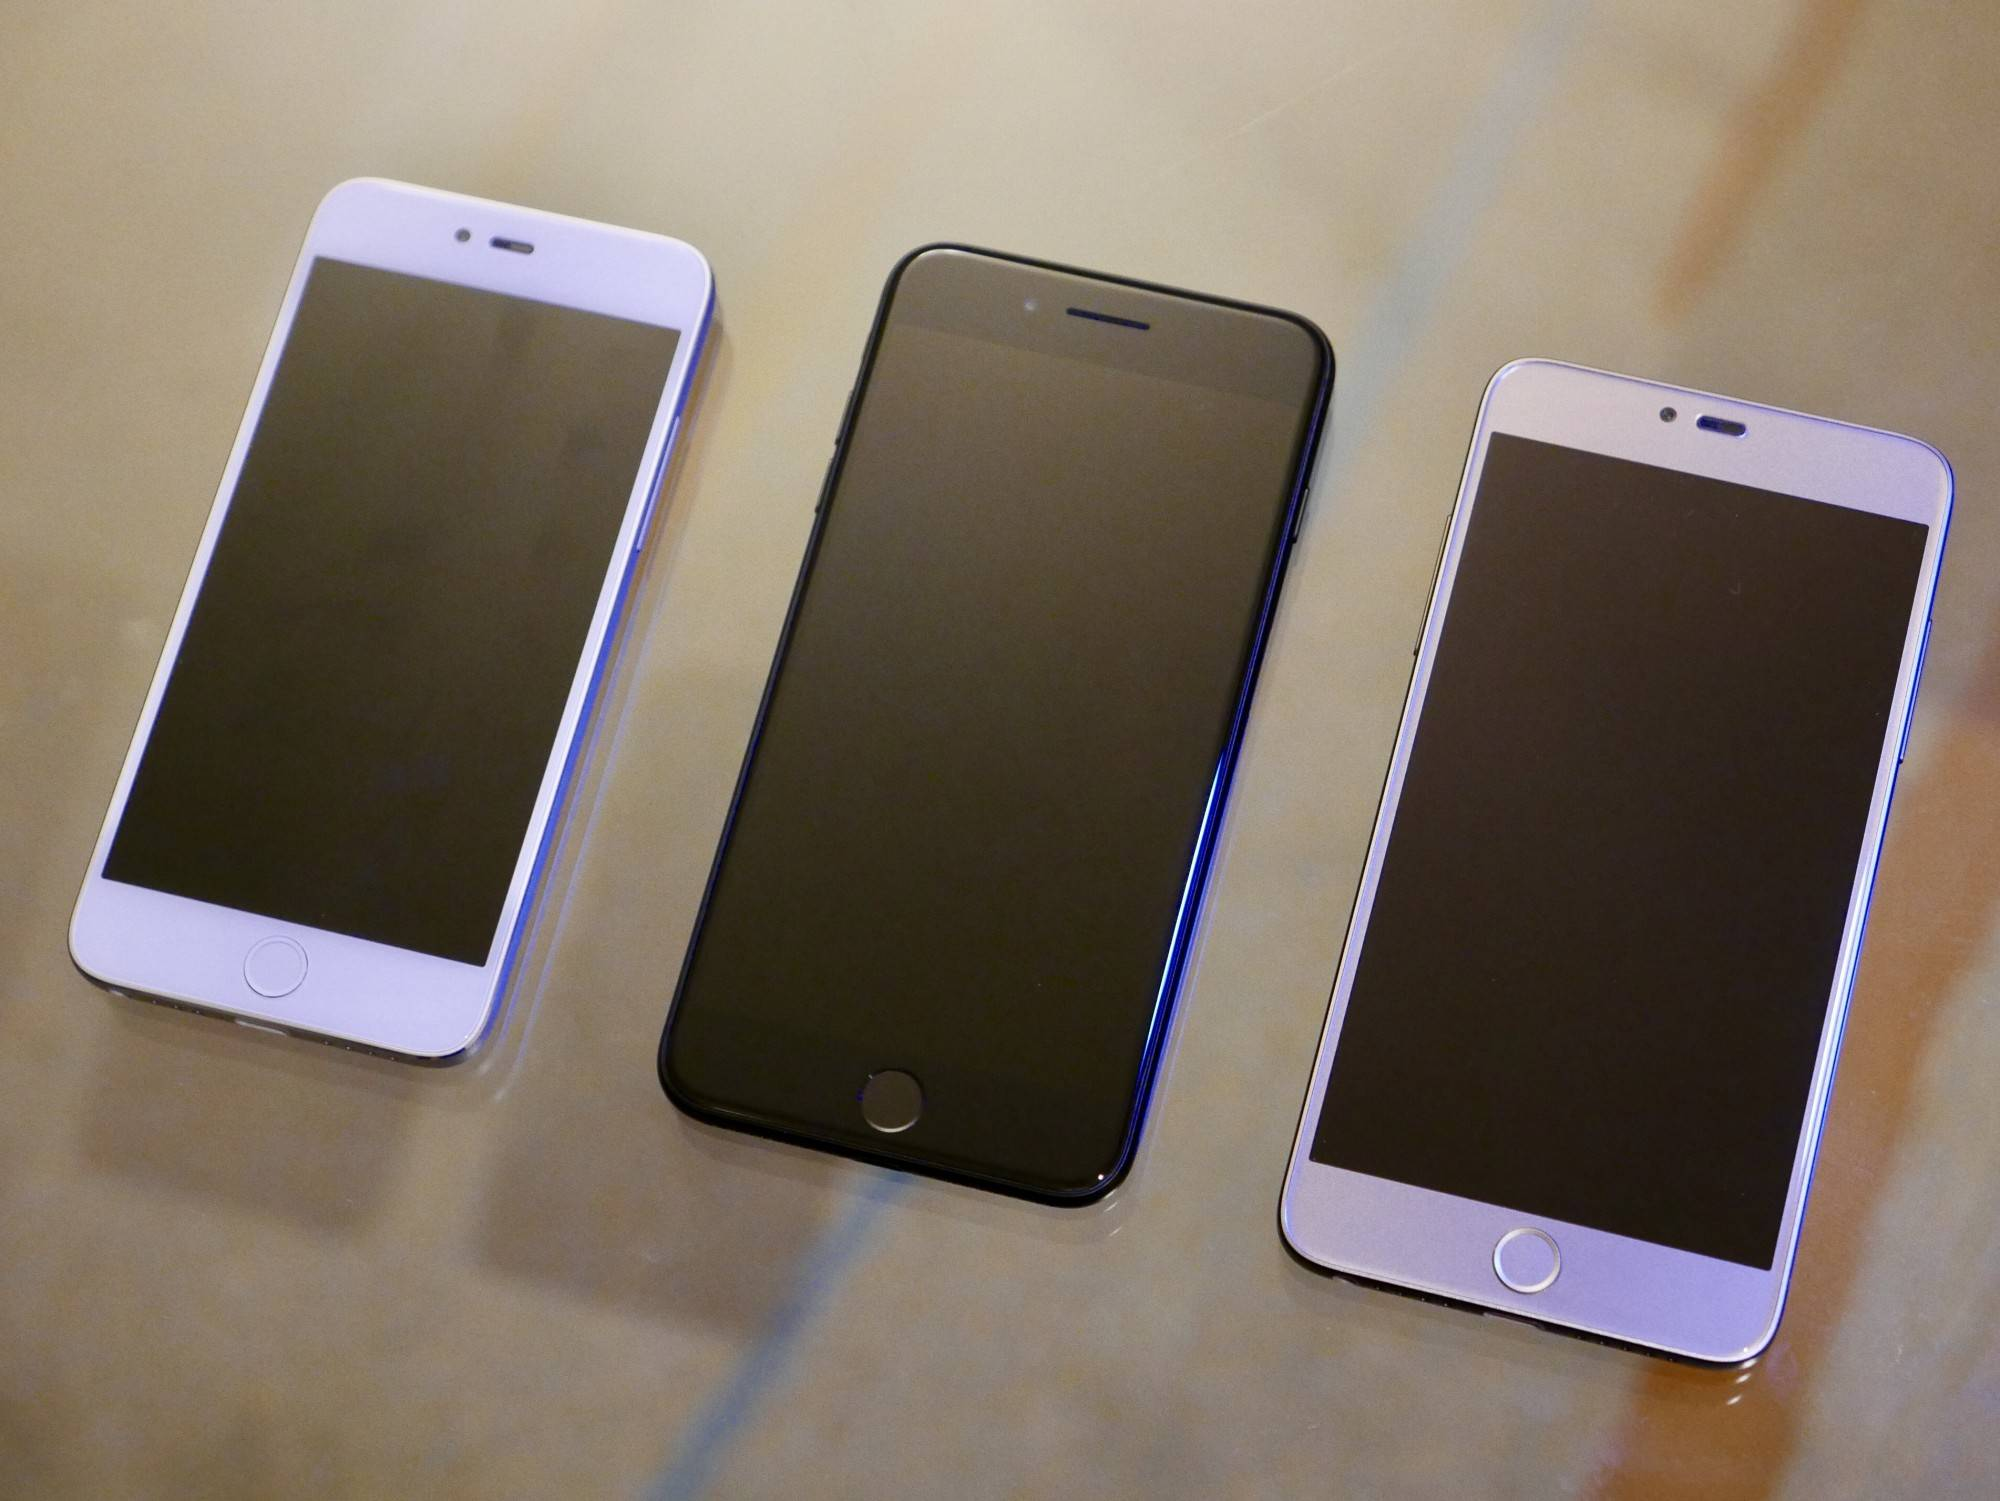 中间的是 iPhone 7 Plus。